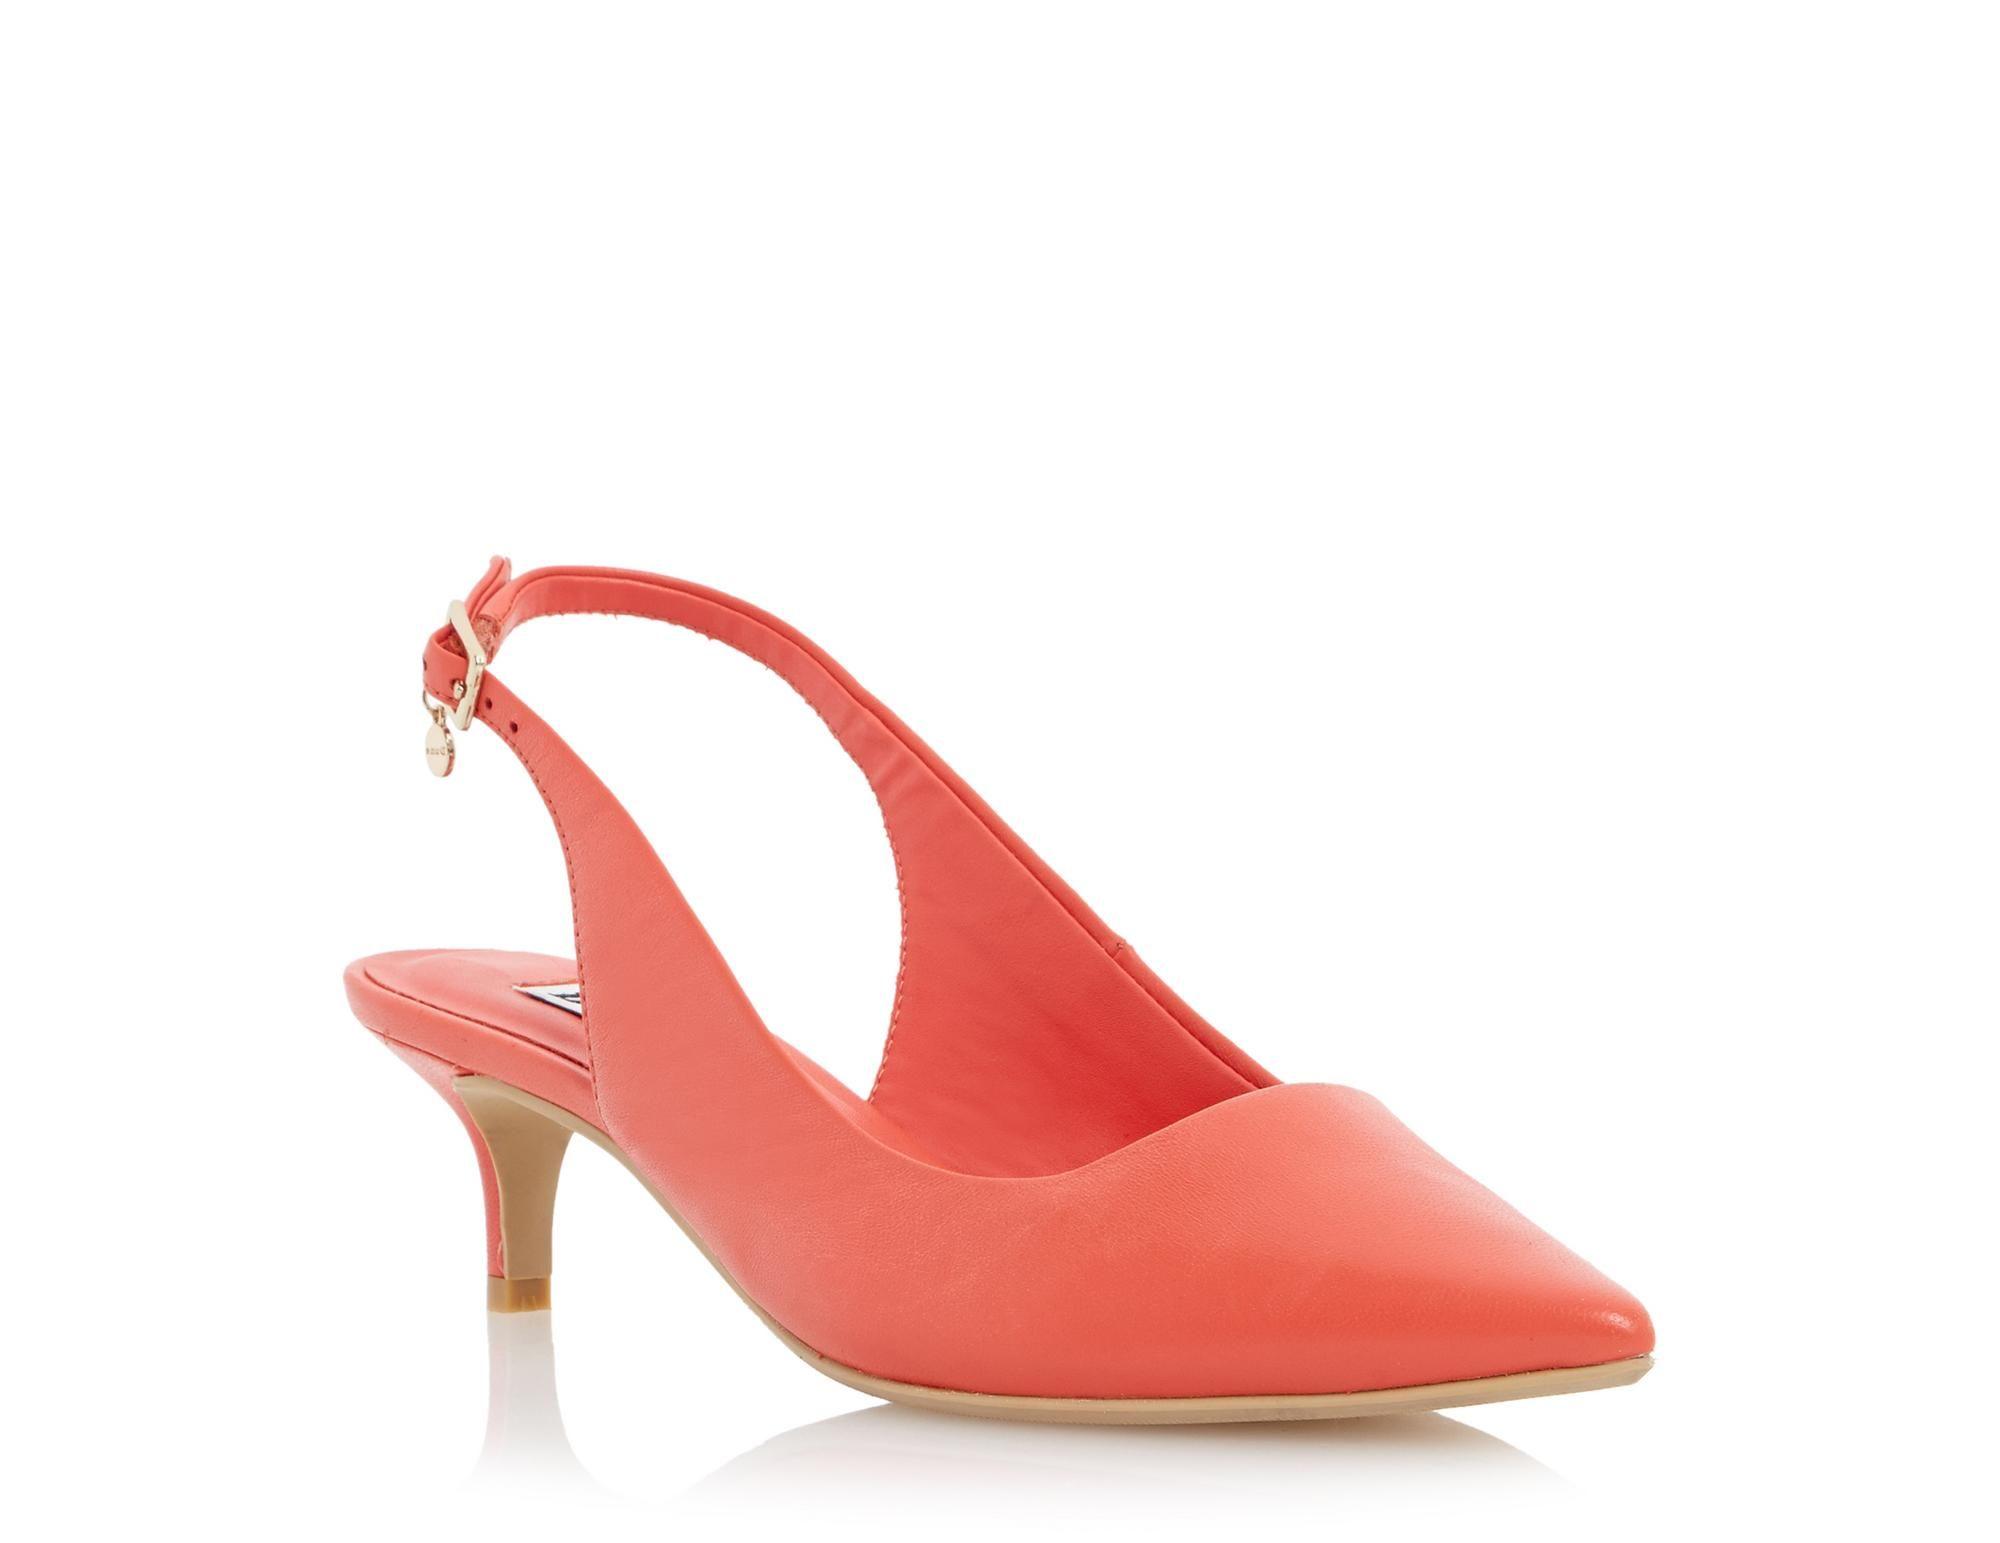 Dune Ladies Cathryne Kitten Heel Slingback Court Shoe Orange Dune Shoes Online Heels Womens High Heels Fashion Shoes